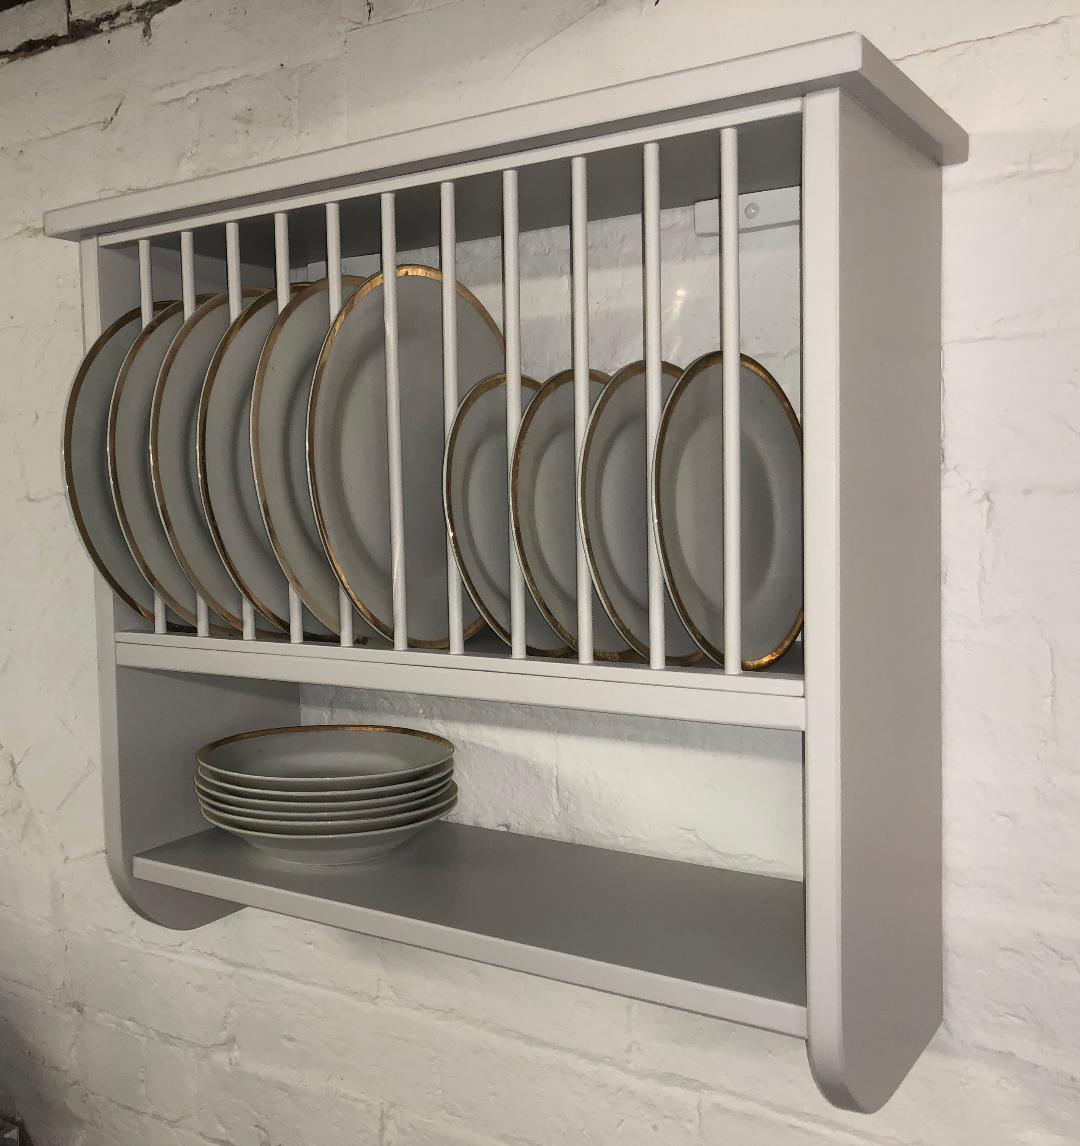 the plate rack co ltd burford rack a wall mounted plate rack. Black Bedroom Furniture Sets. Home Design Ideas